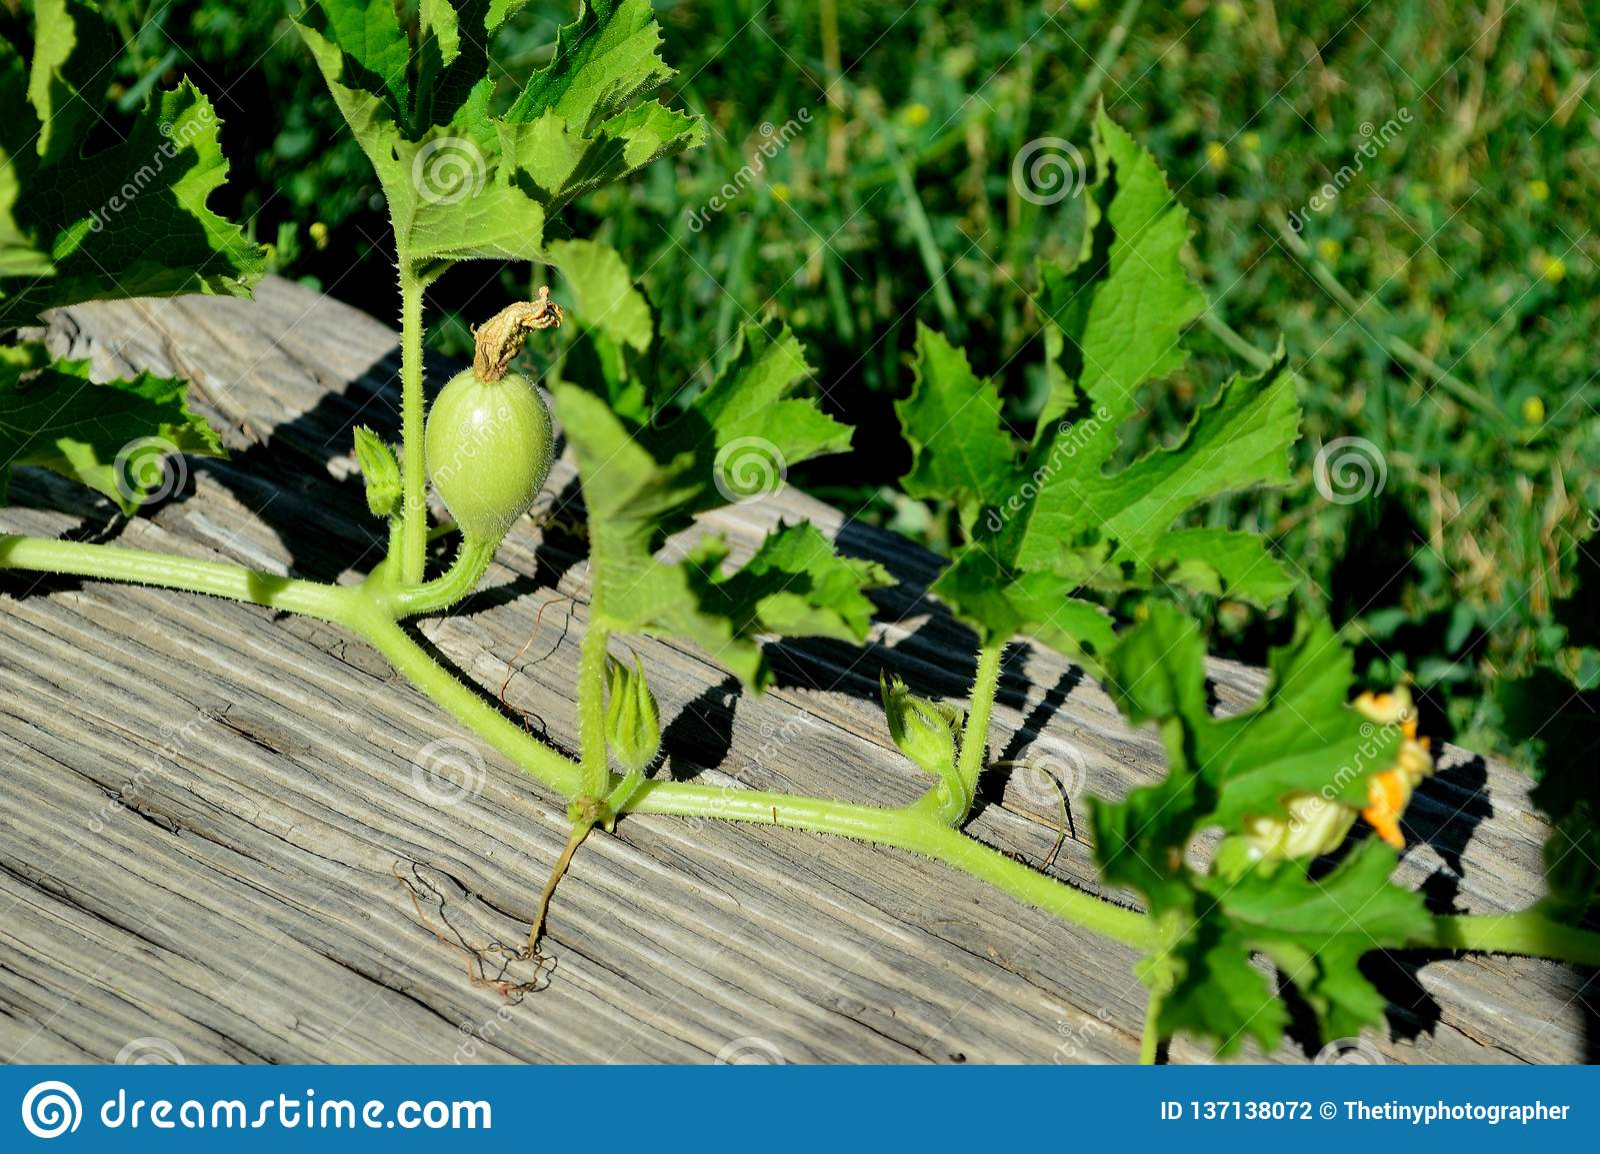 bb5e1051c2d Spaghetti Squash Fruit And Flower On Vine Stock Photo - Image of ...